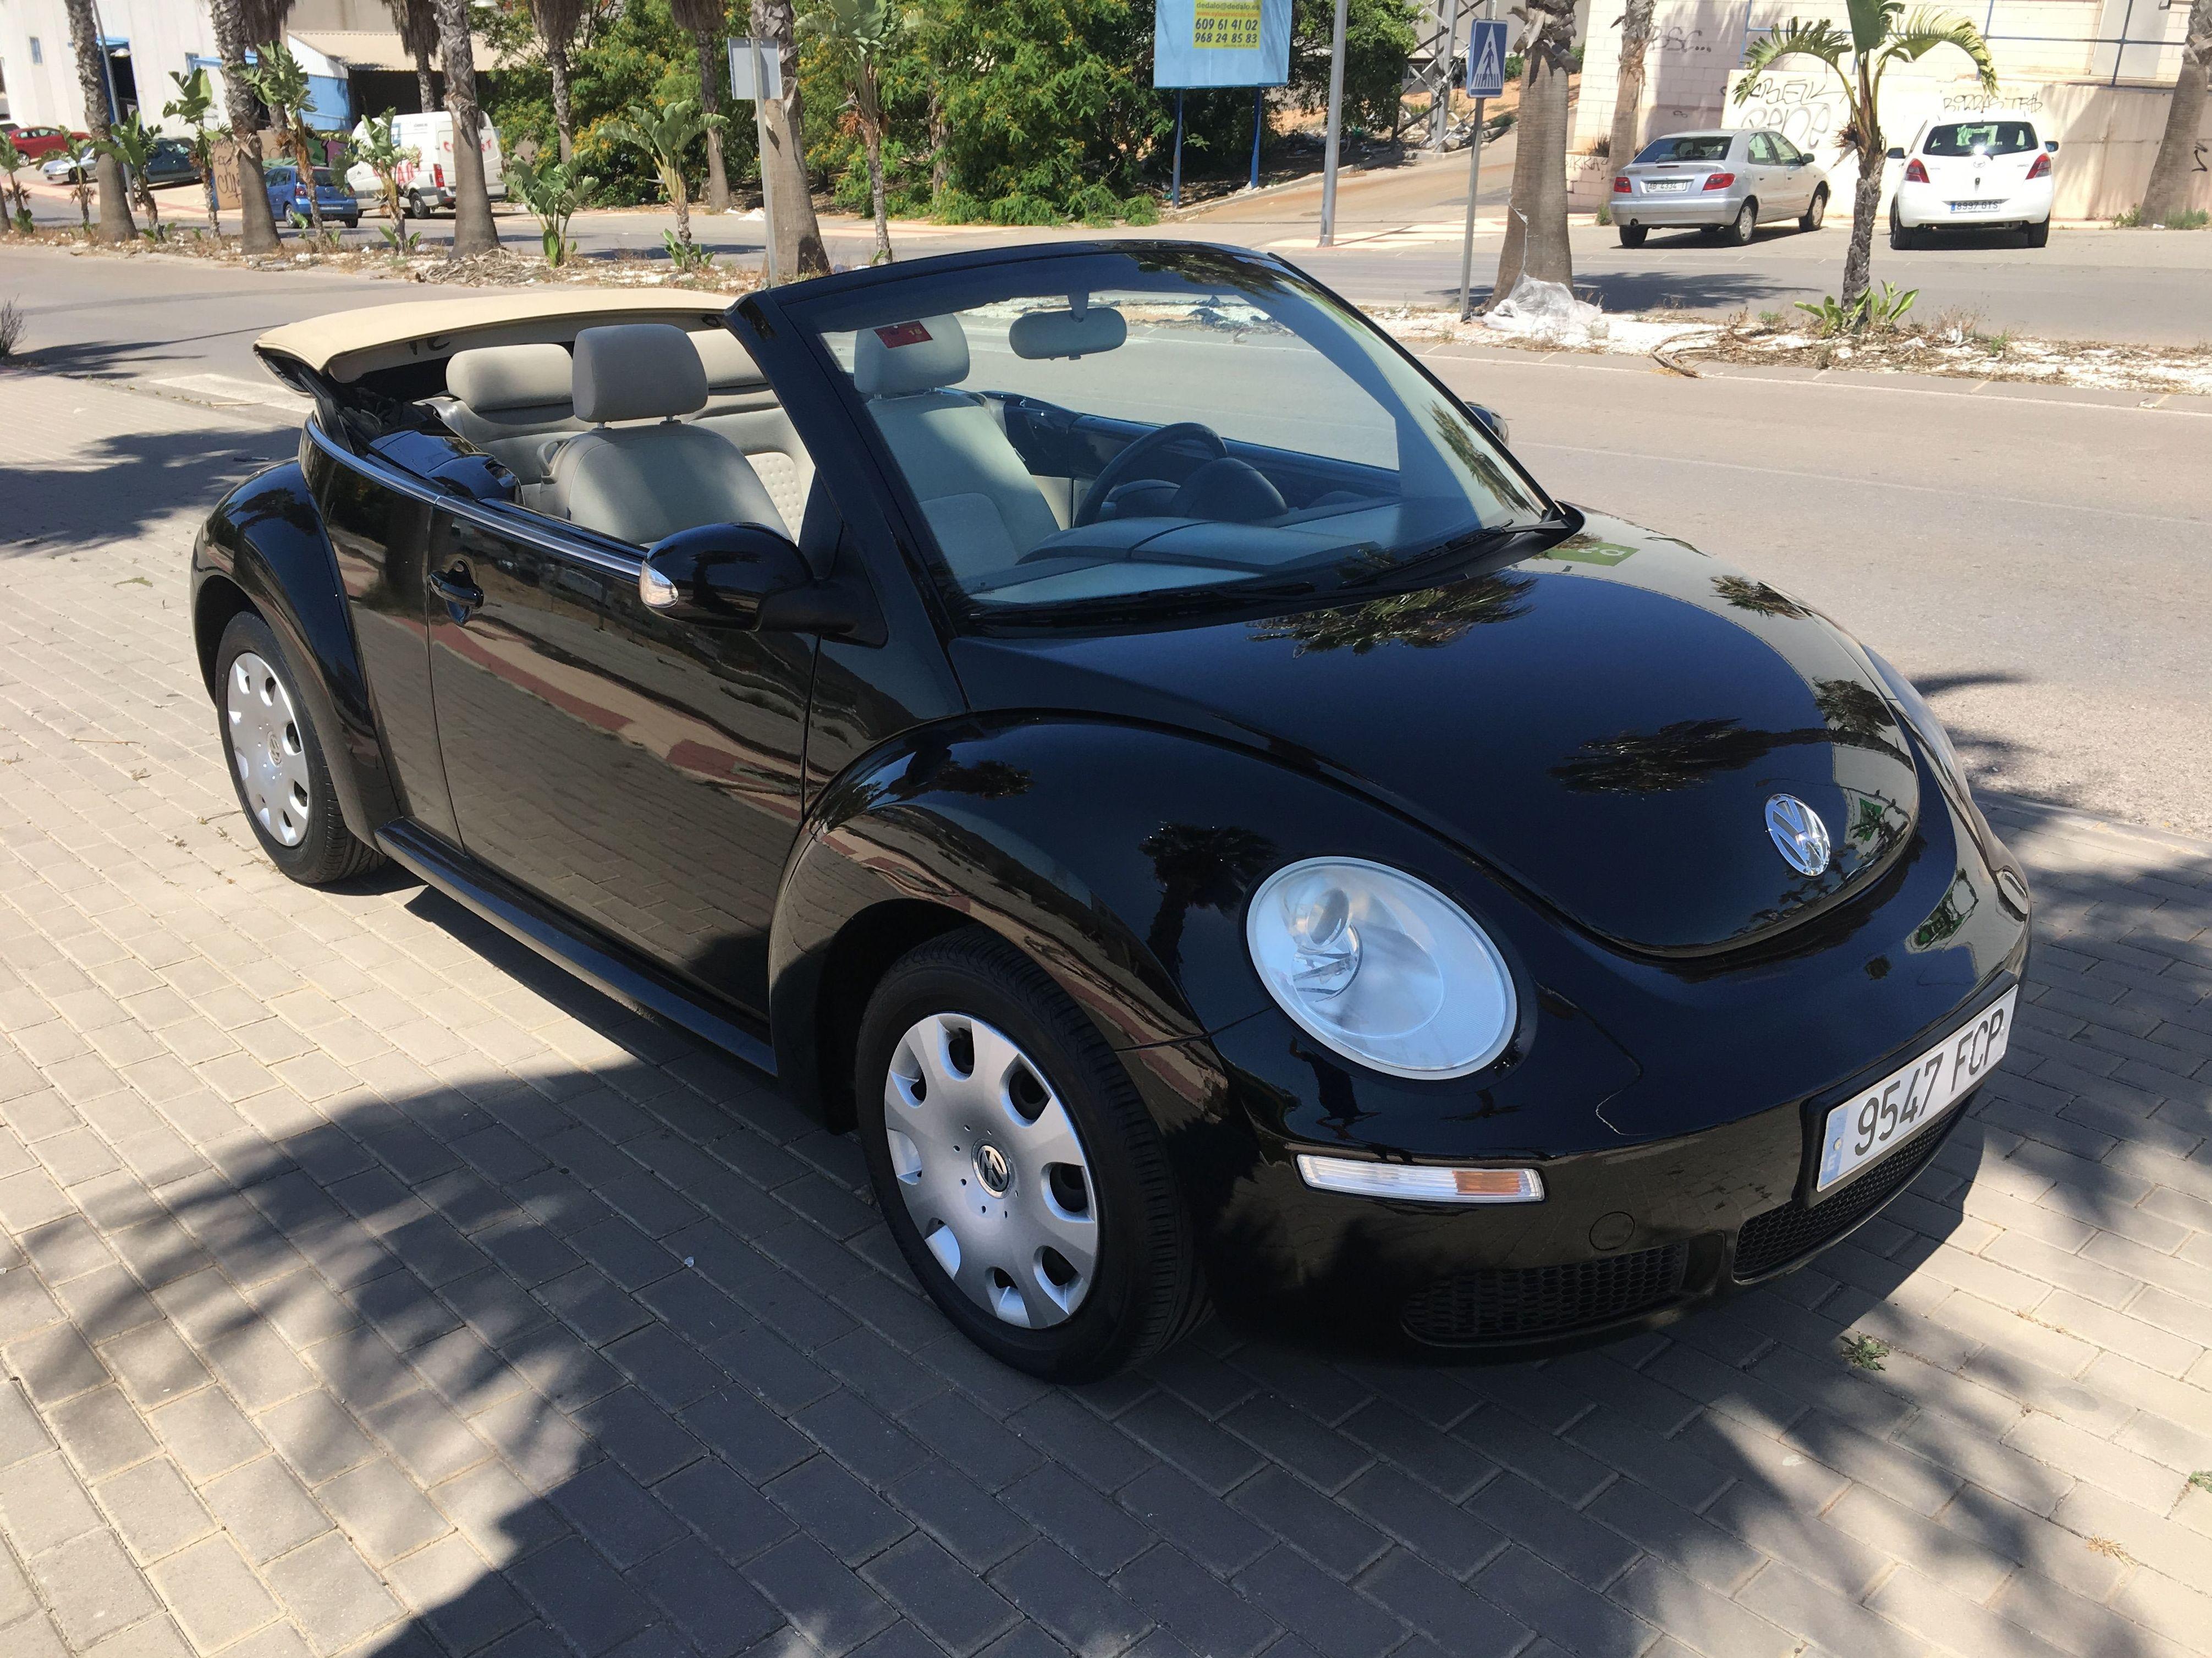 V.W. BEETLE CABRIO: COCHES DE OCASION de Navirent-Automóviles Parque Mediterráneo